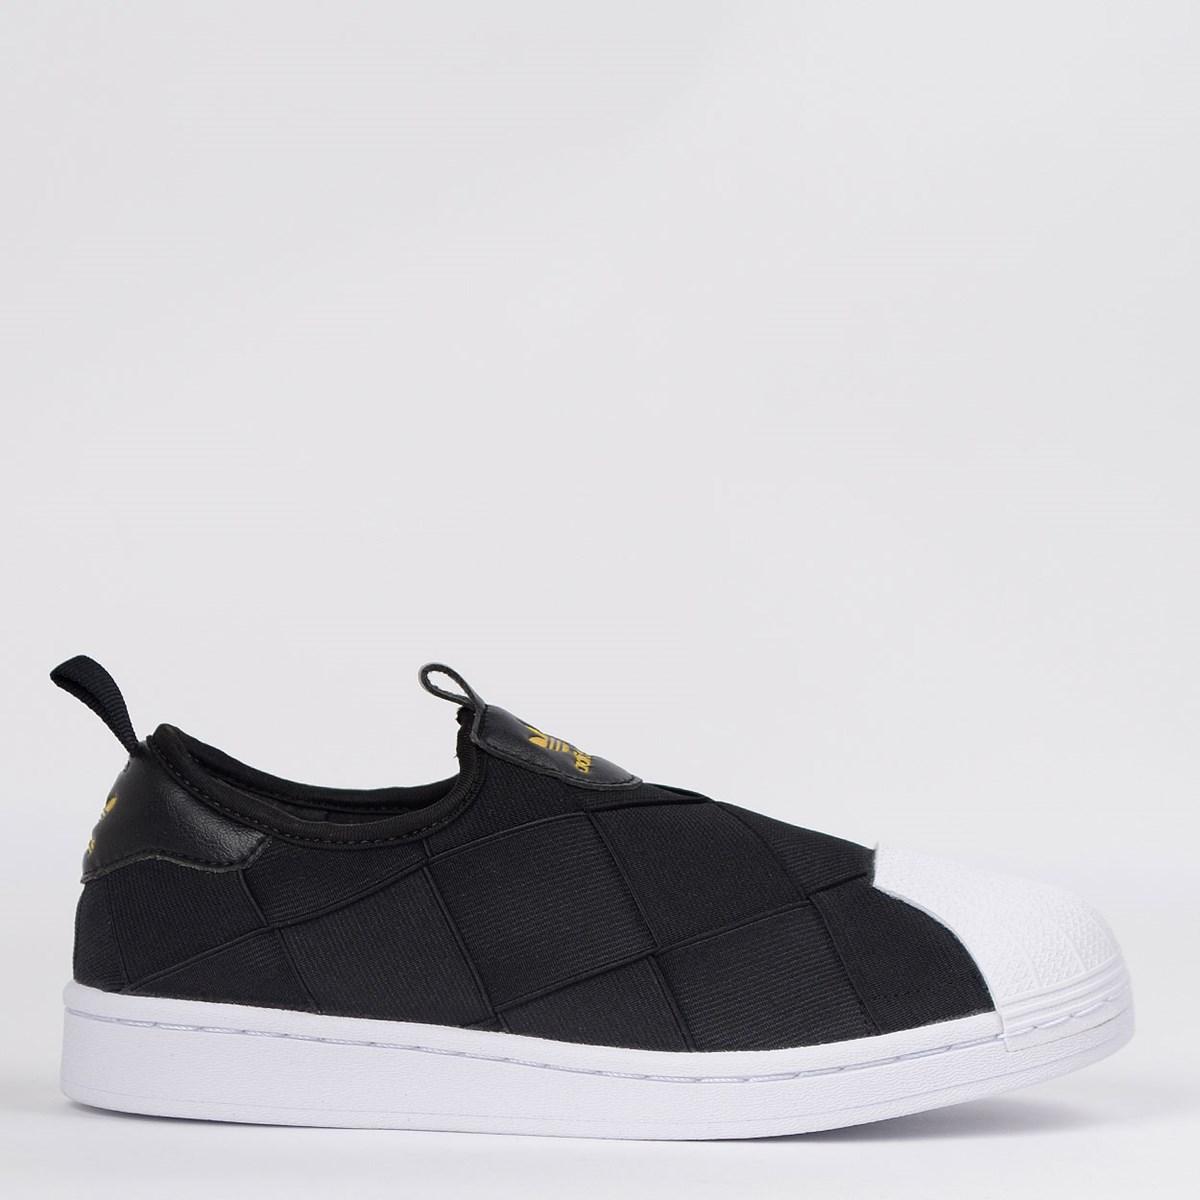 Tênis Adidas Superstar Slip On Preto FV3187